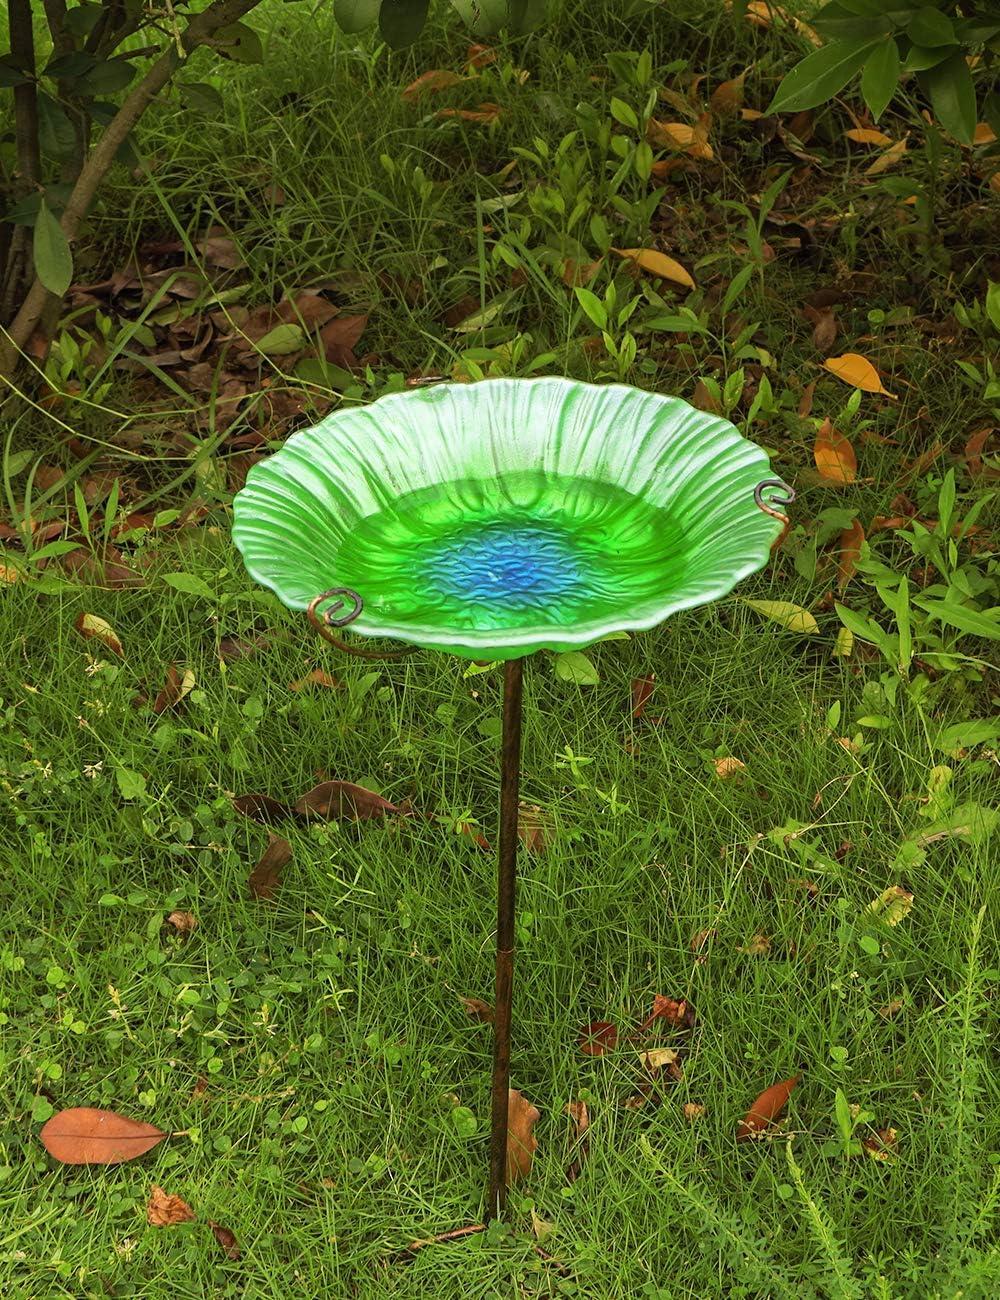 MUMTOP 26-Inch Height Glass Birdbath with Metal Stake